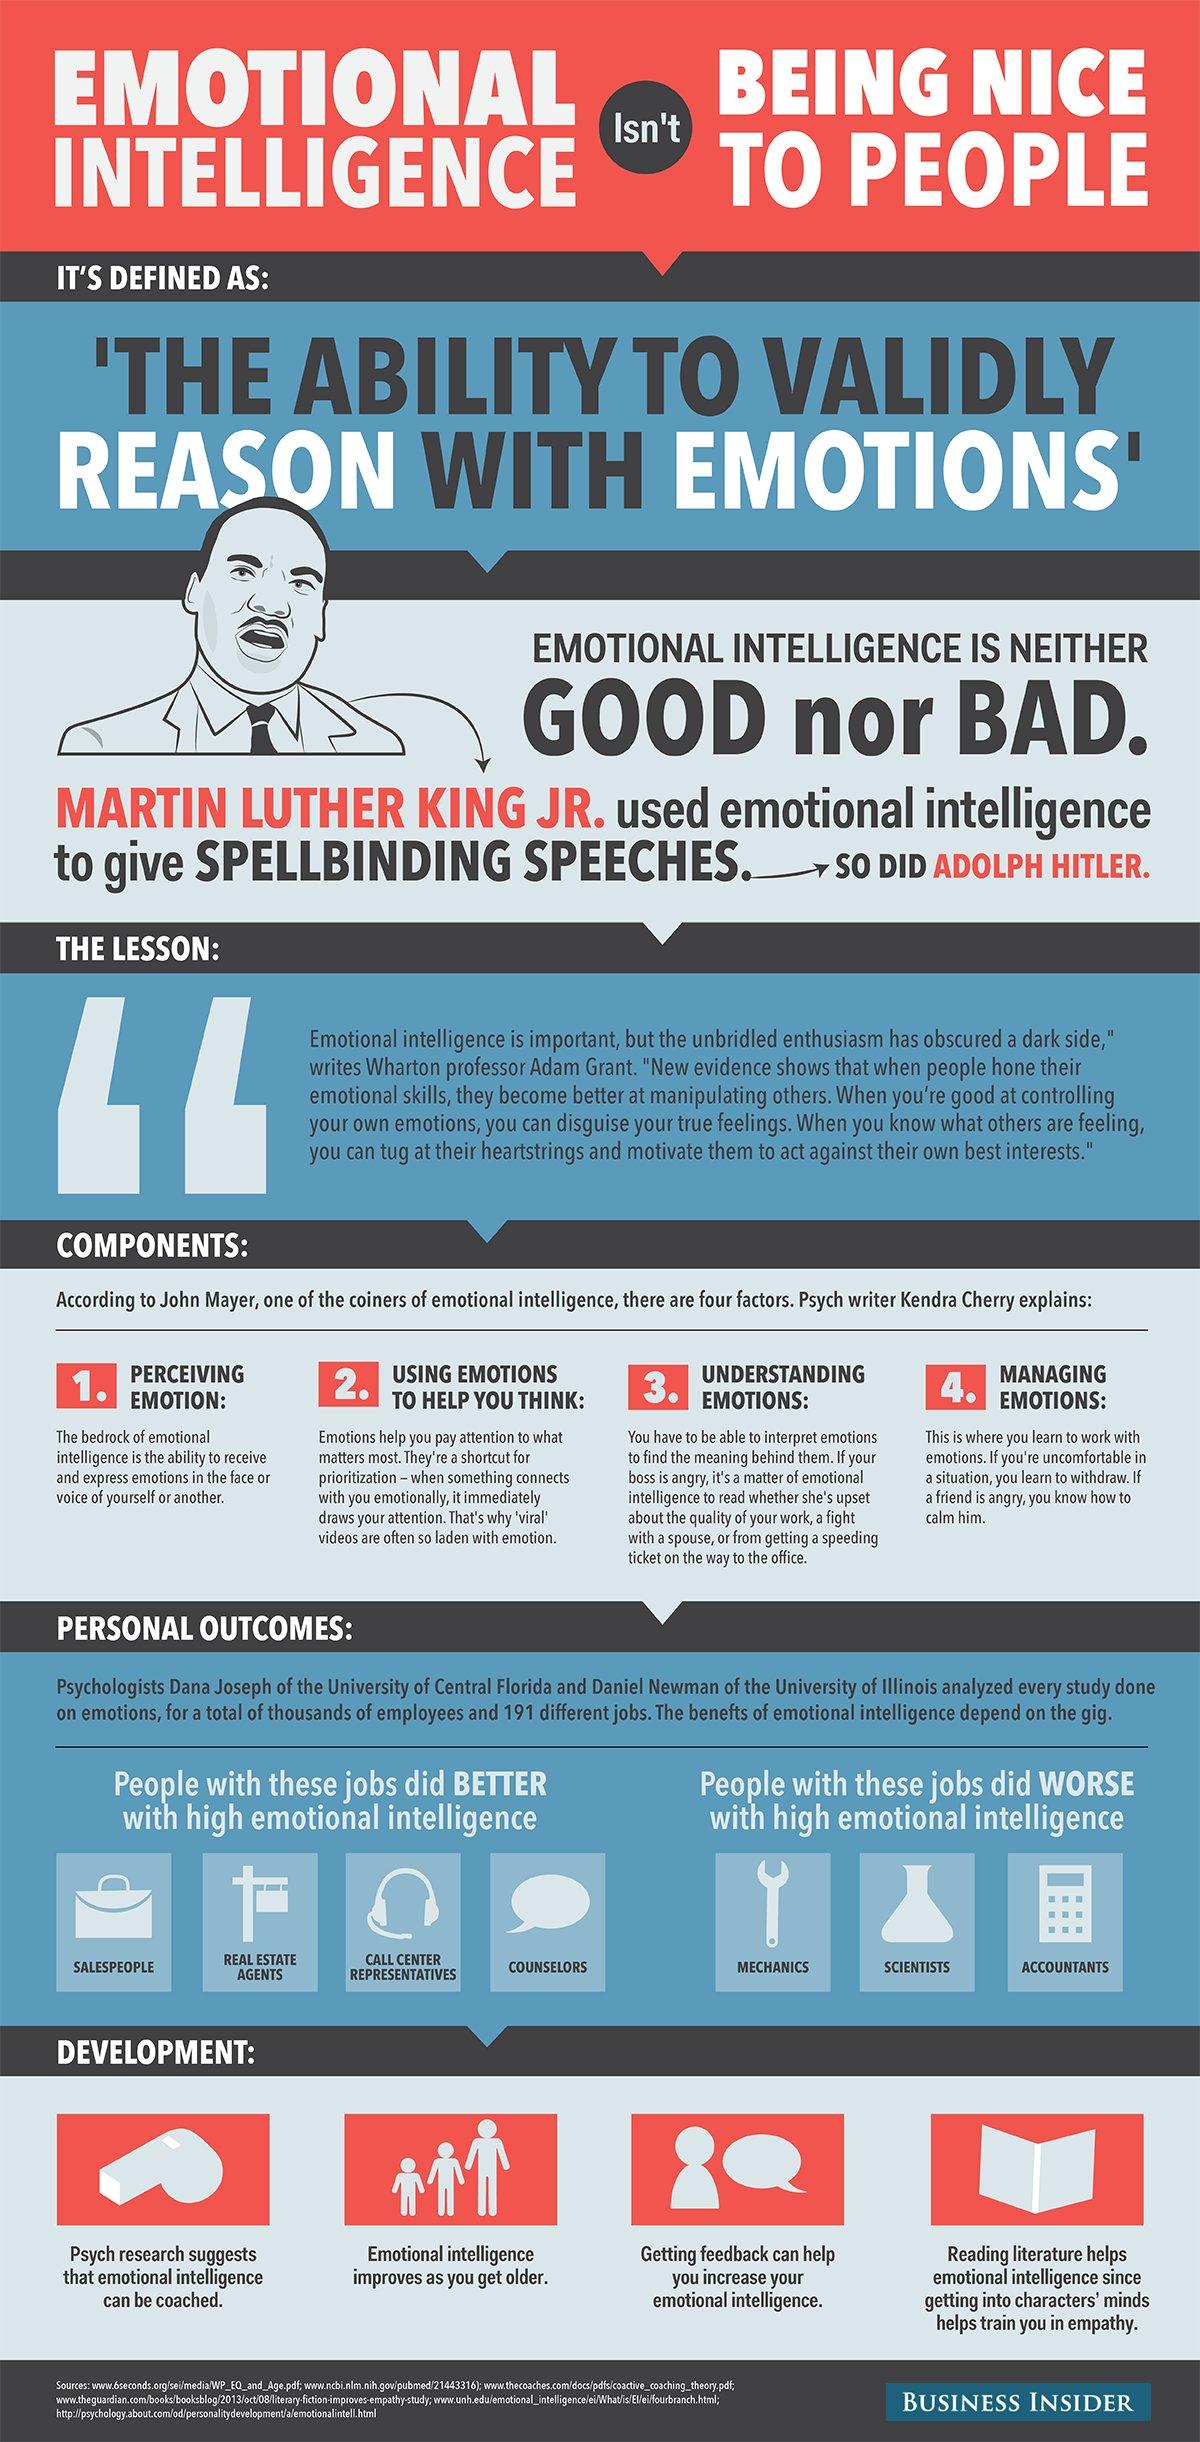 emotional intelligence isn't being nice to people